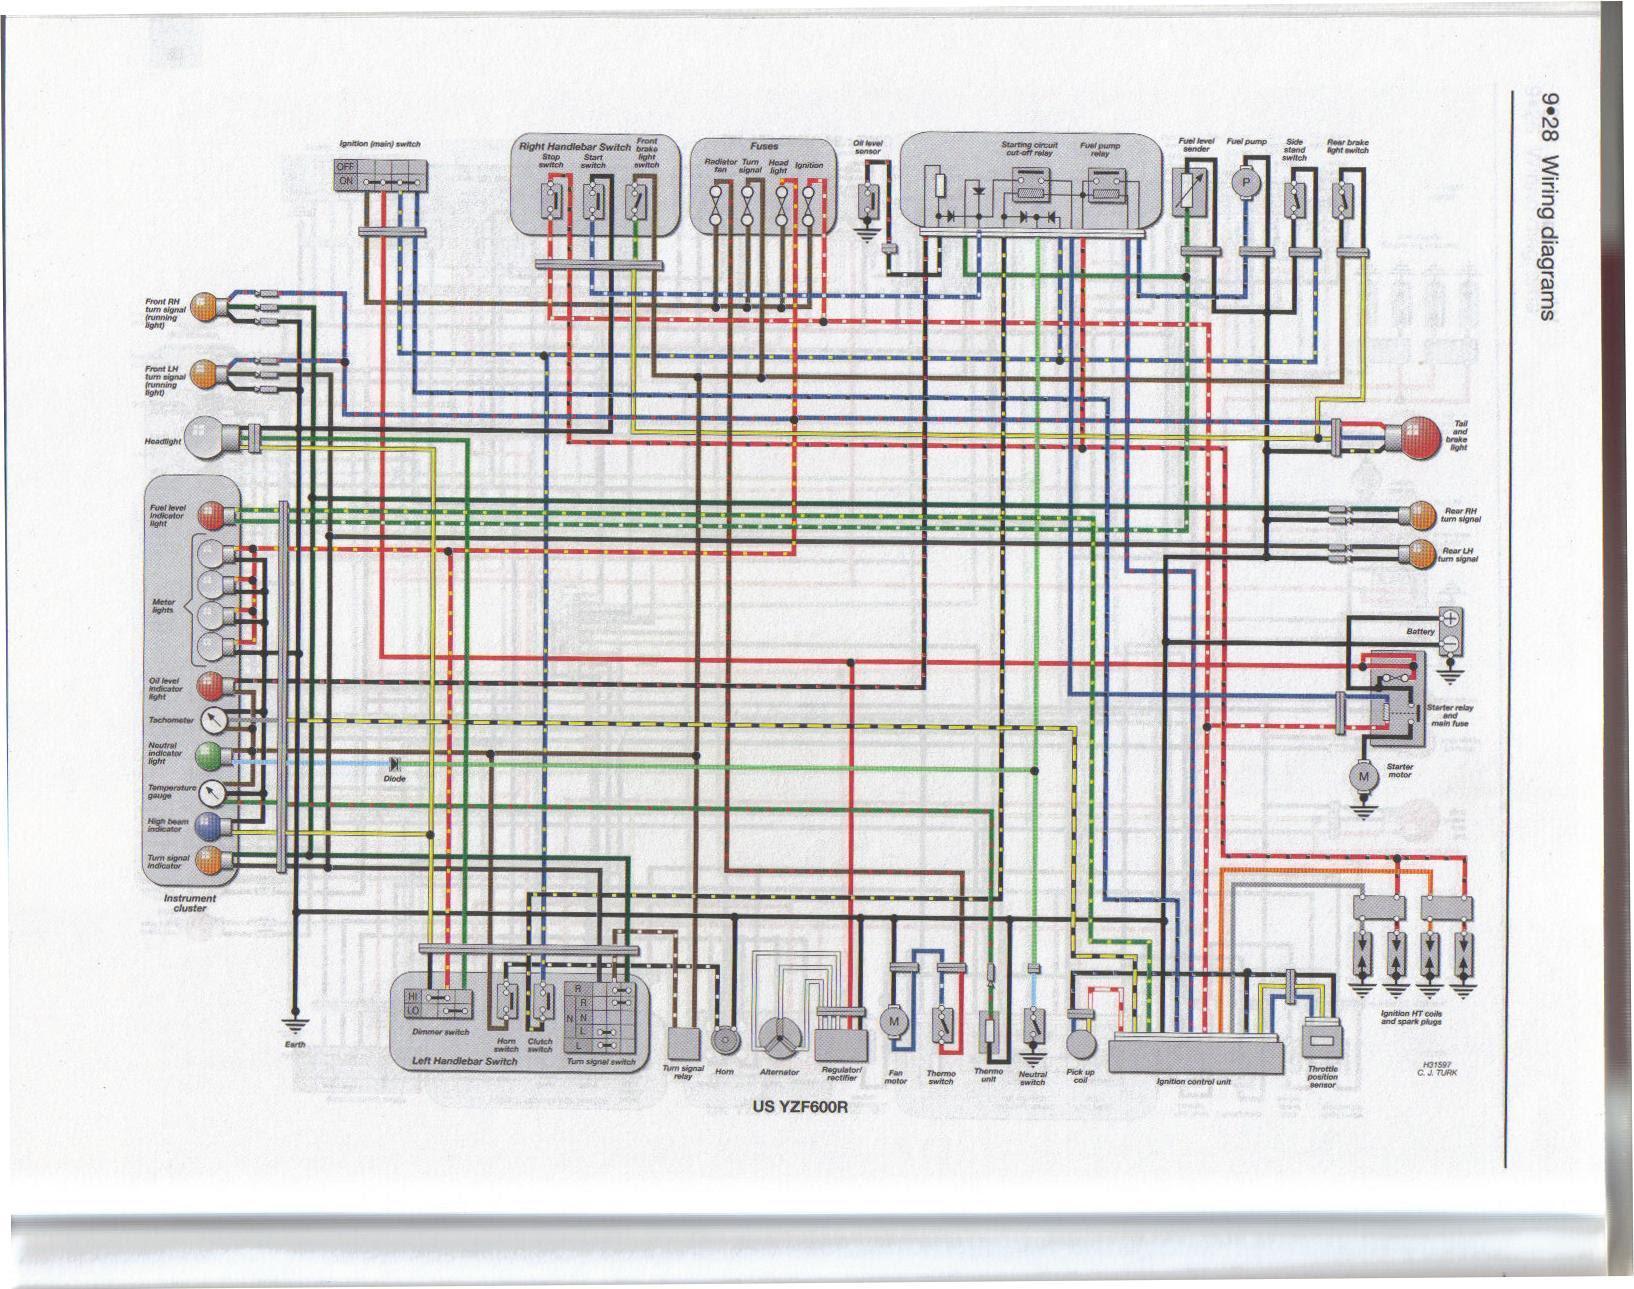 Diagram 2002 Yzf 600 Wiring Diagram Full Version Hd Quality Wiring Diagram Shipwiringl Ripettapalace It